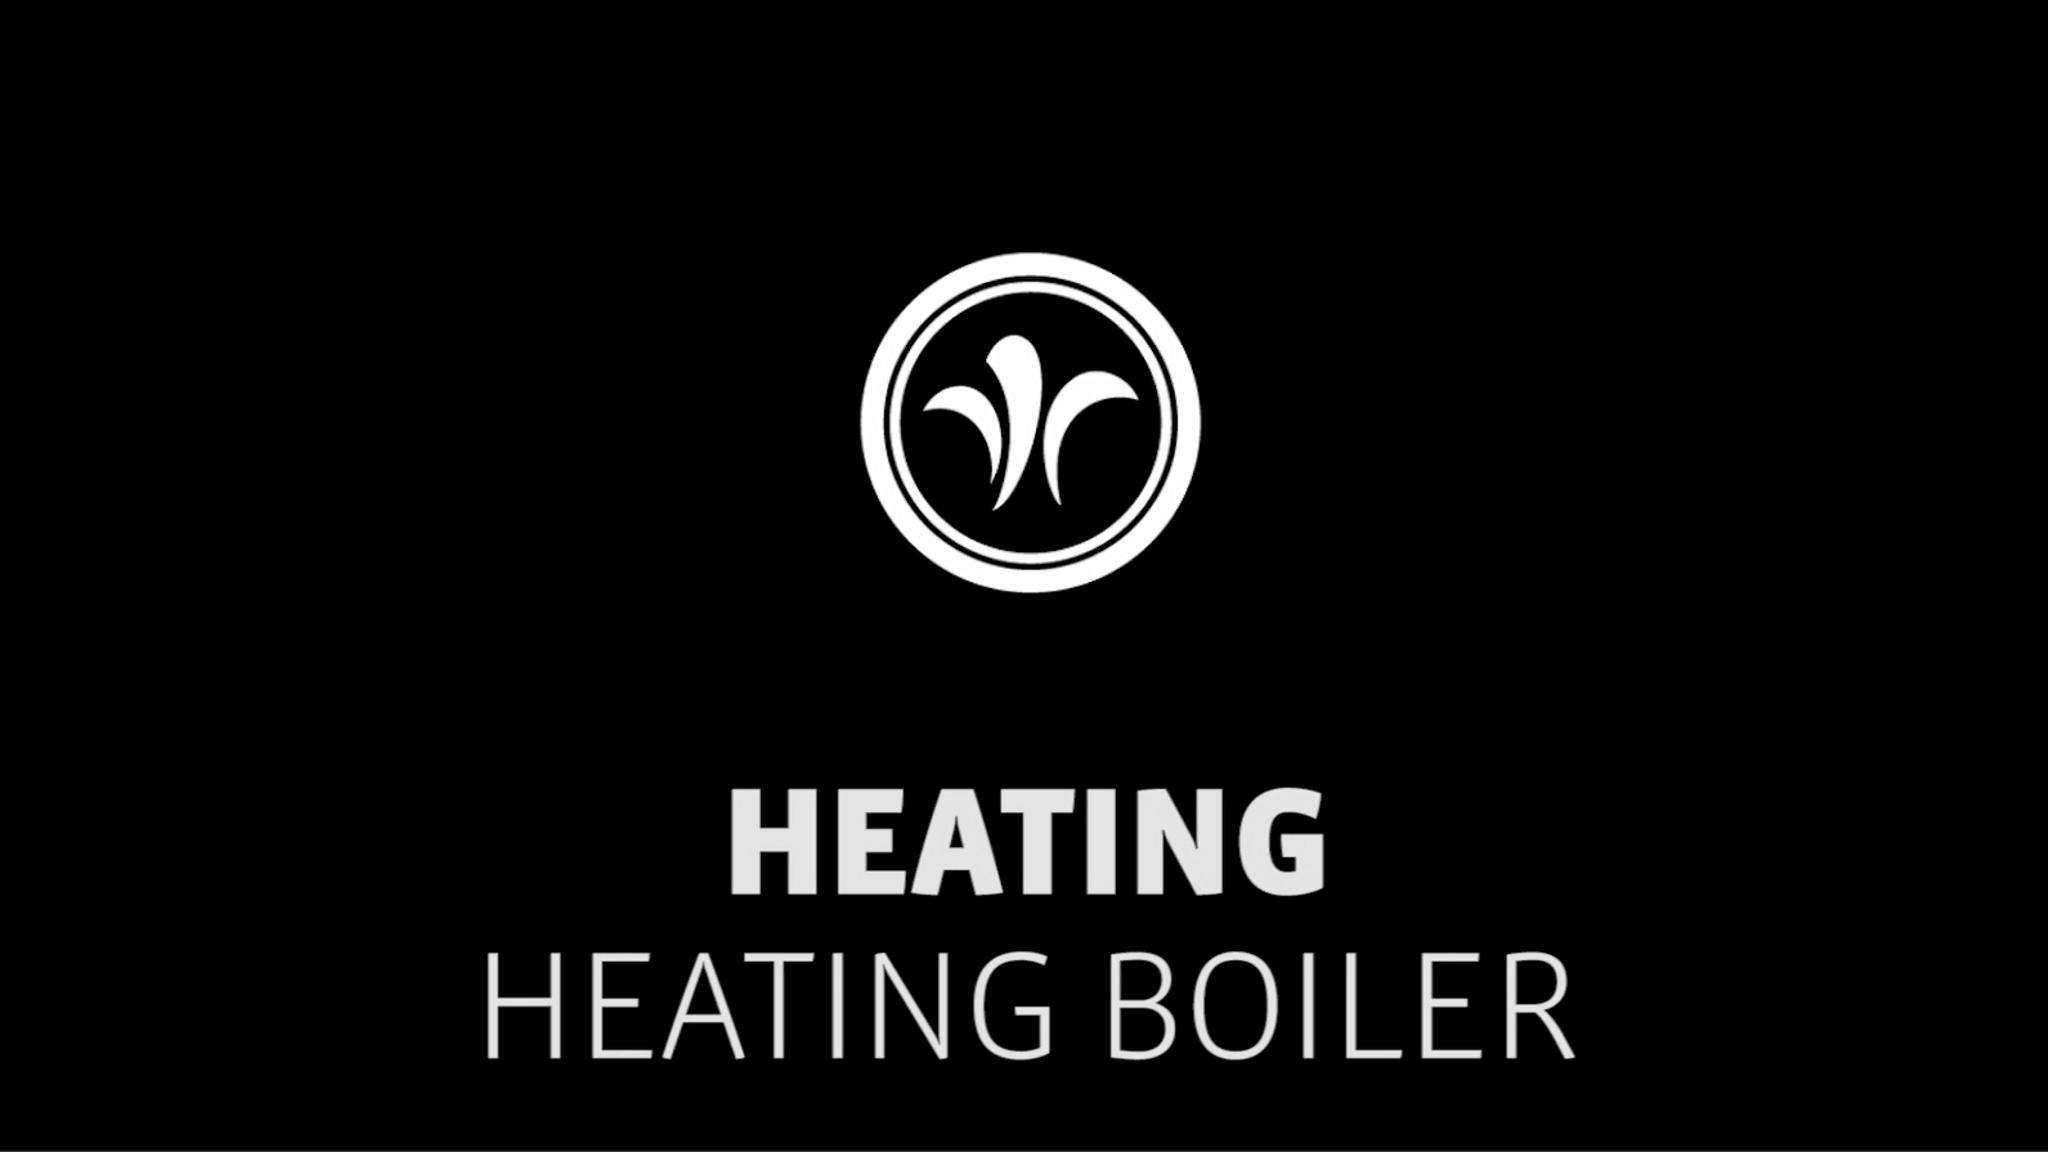 motorhome boiler // niesmann+bischoff - camper (model ARTO) // 2019 // H4